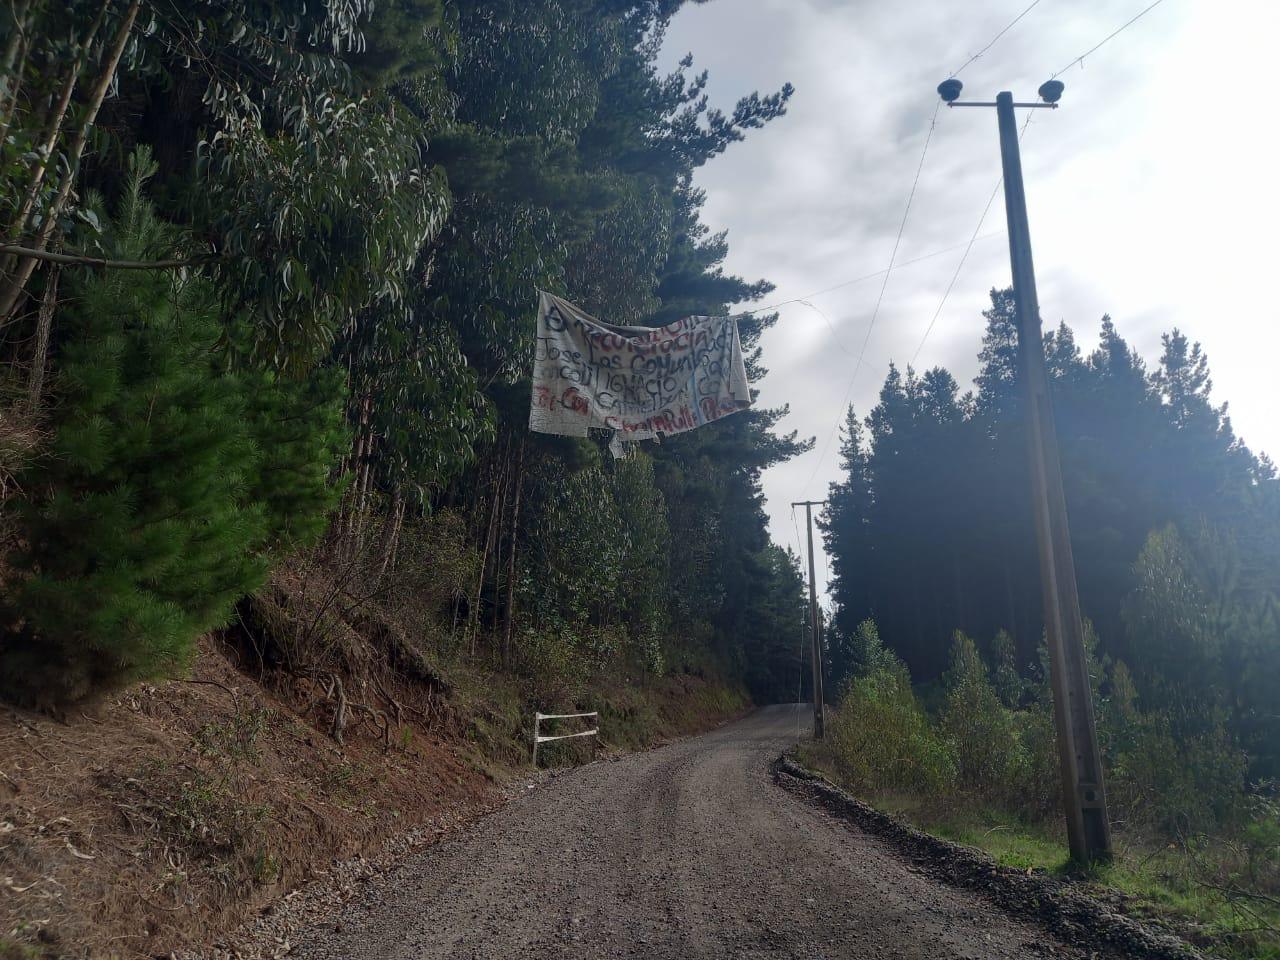 Entrada del Fundo Santa Ana de Forestal Mininco